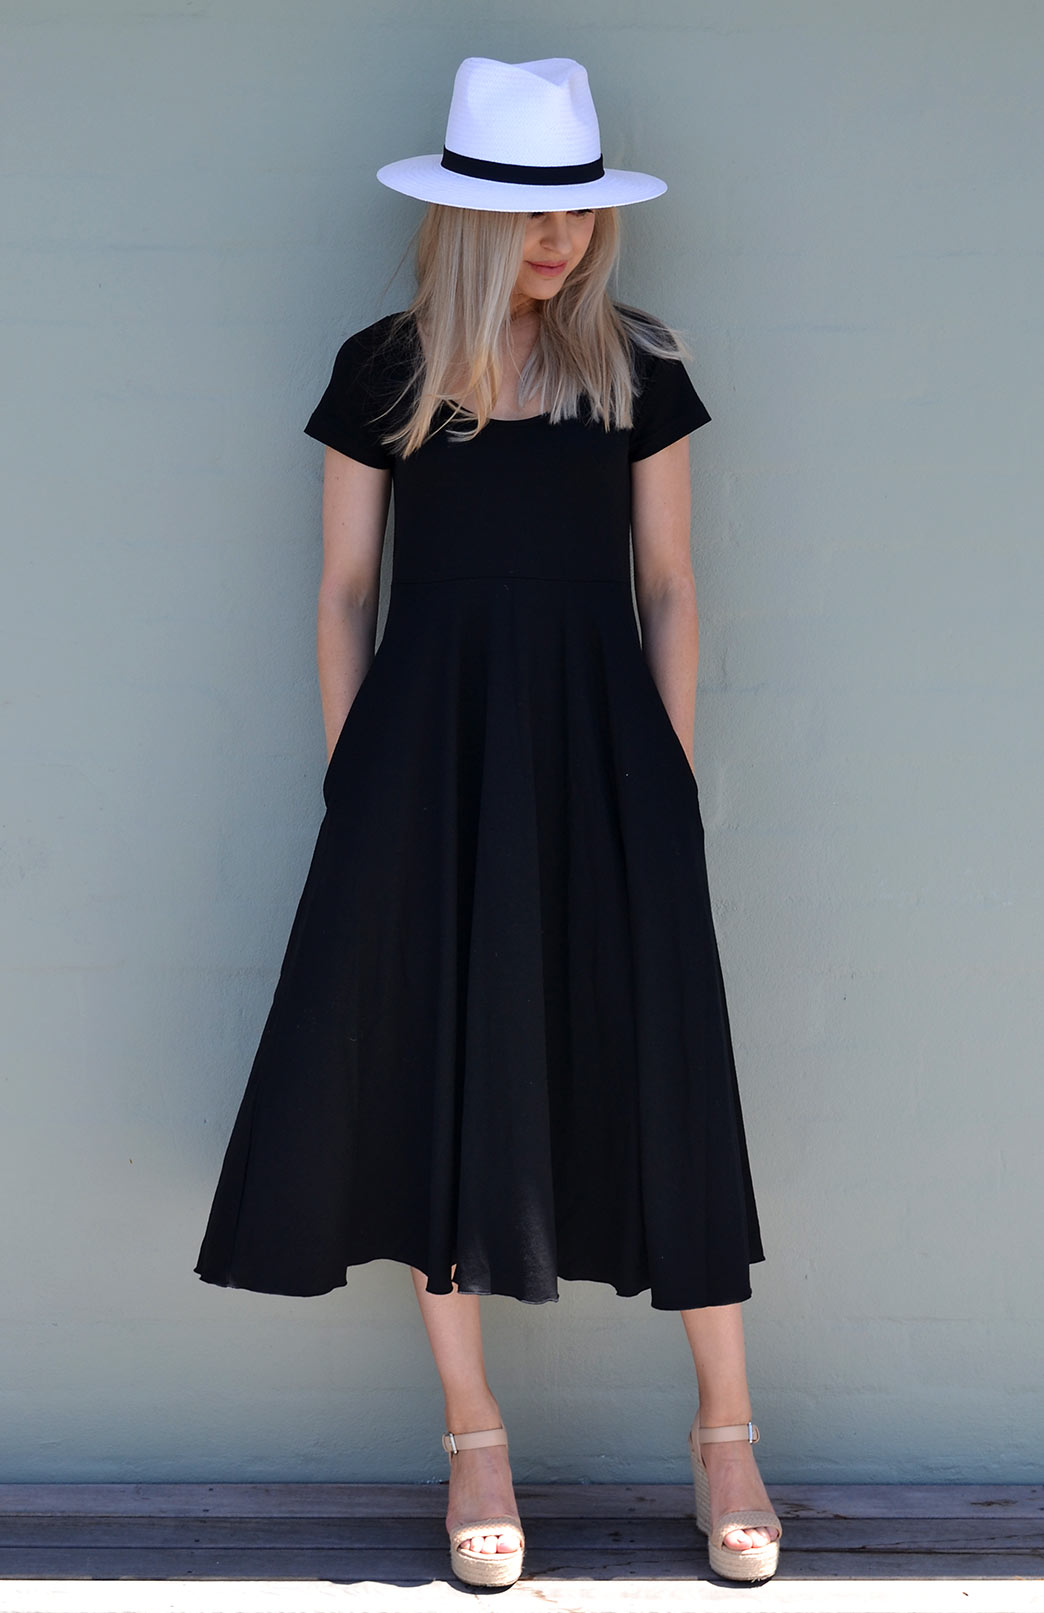 Carrie Dress - Women's Cap Sleeve Classic Black Merino Wool Summer Dress - Smitten Merino Tasmania Australia